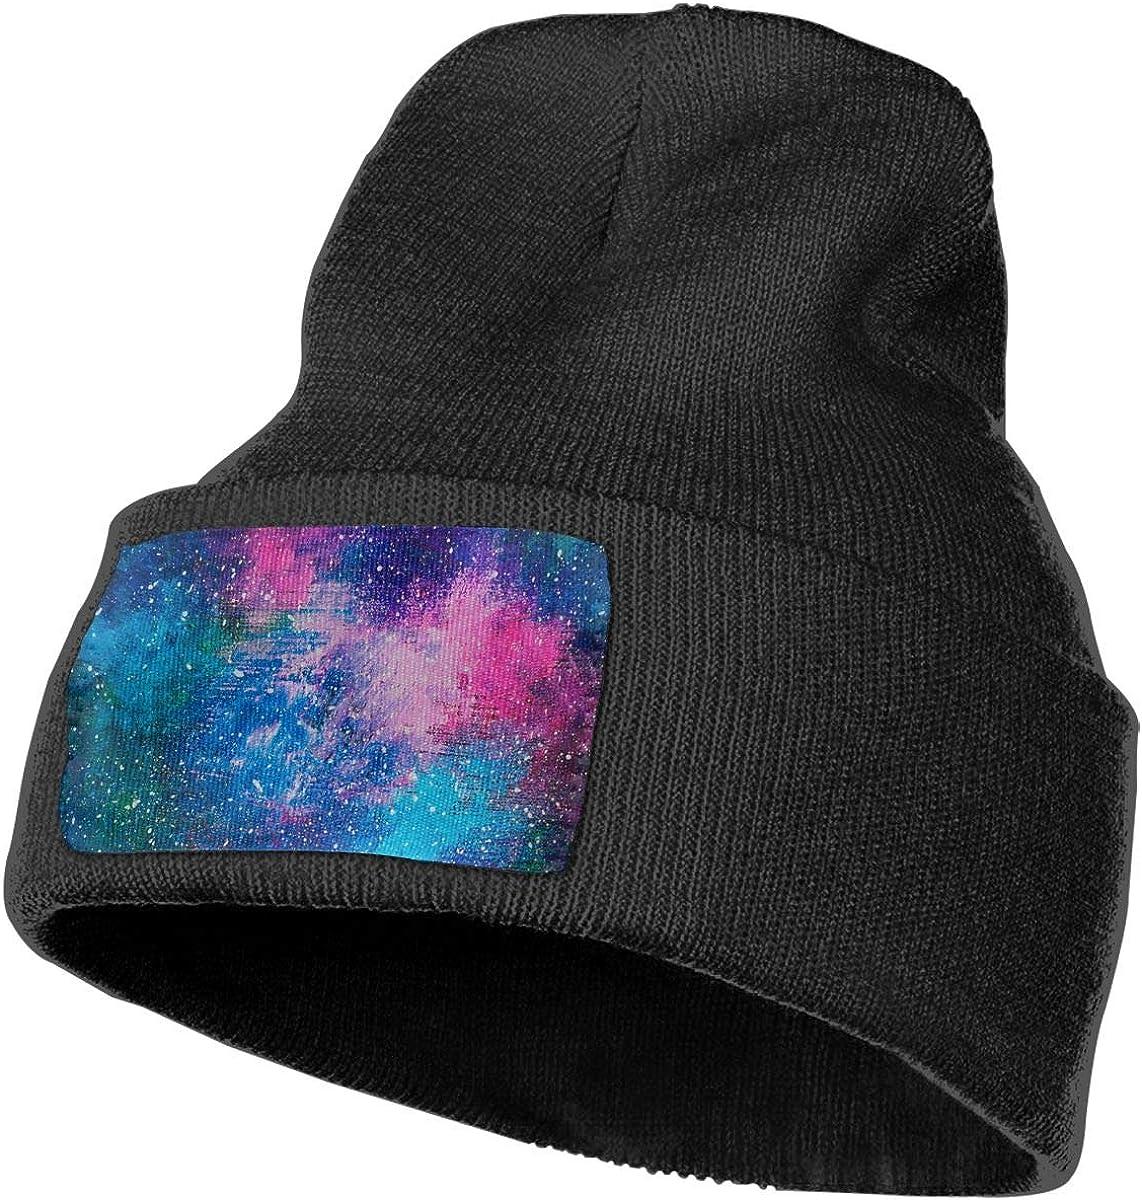 JZMY6 Galaxy 4 Funky Beanie Hat Skull Cap